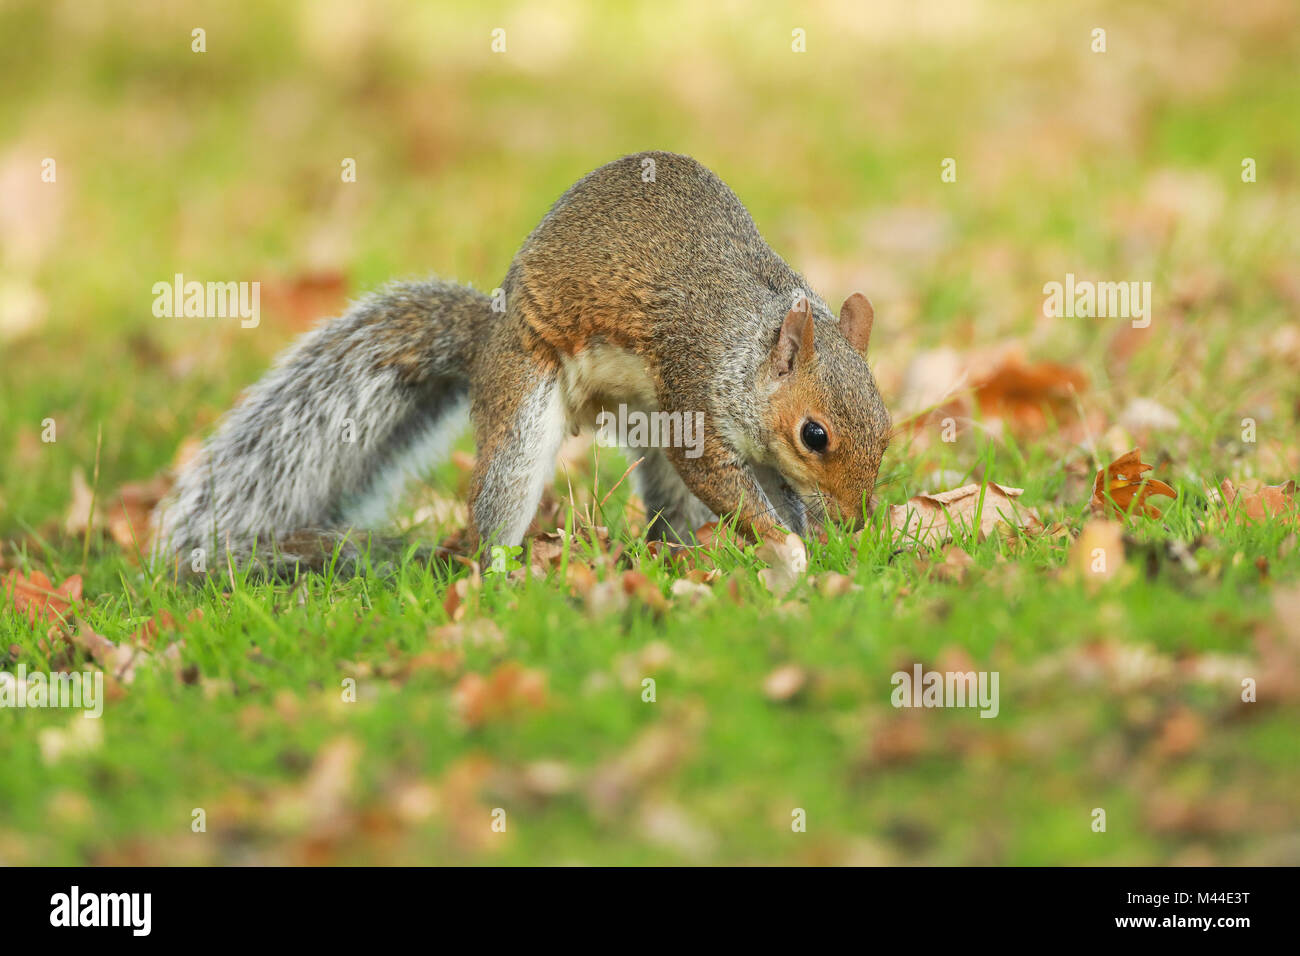 Grey Squirrel, Gray Squirrel (Sciurus carolinensis) burying an acorn in a cache. Richmond Park, London, England - Stock Image